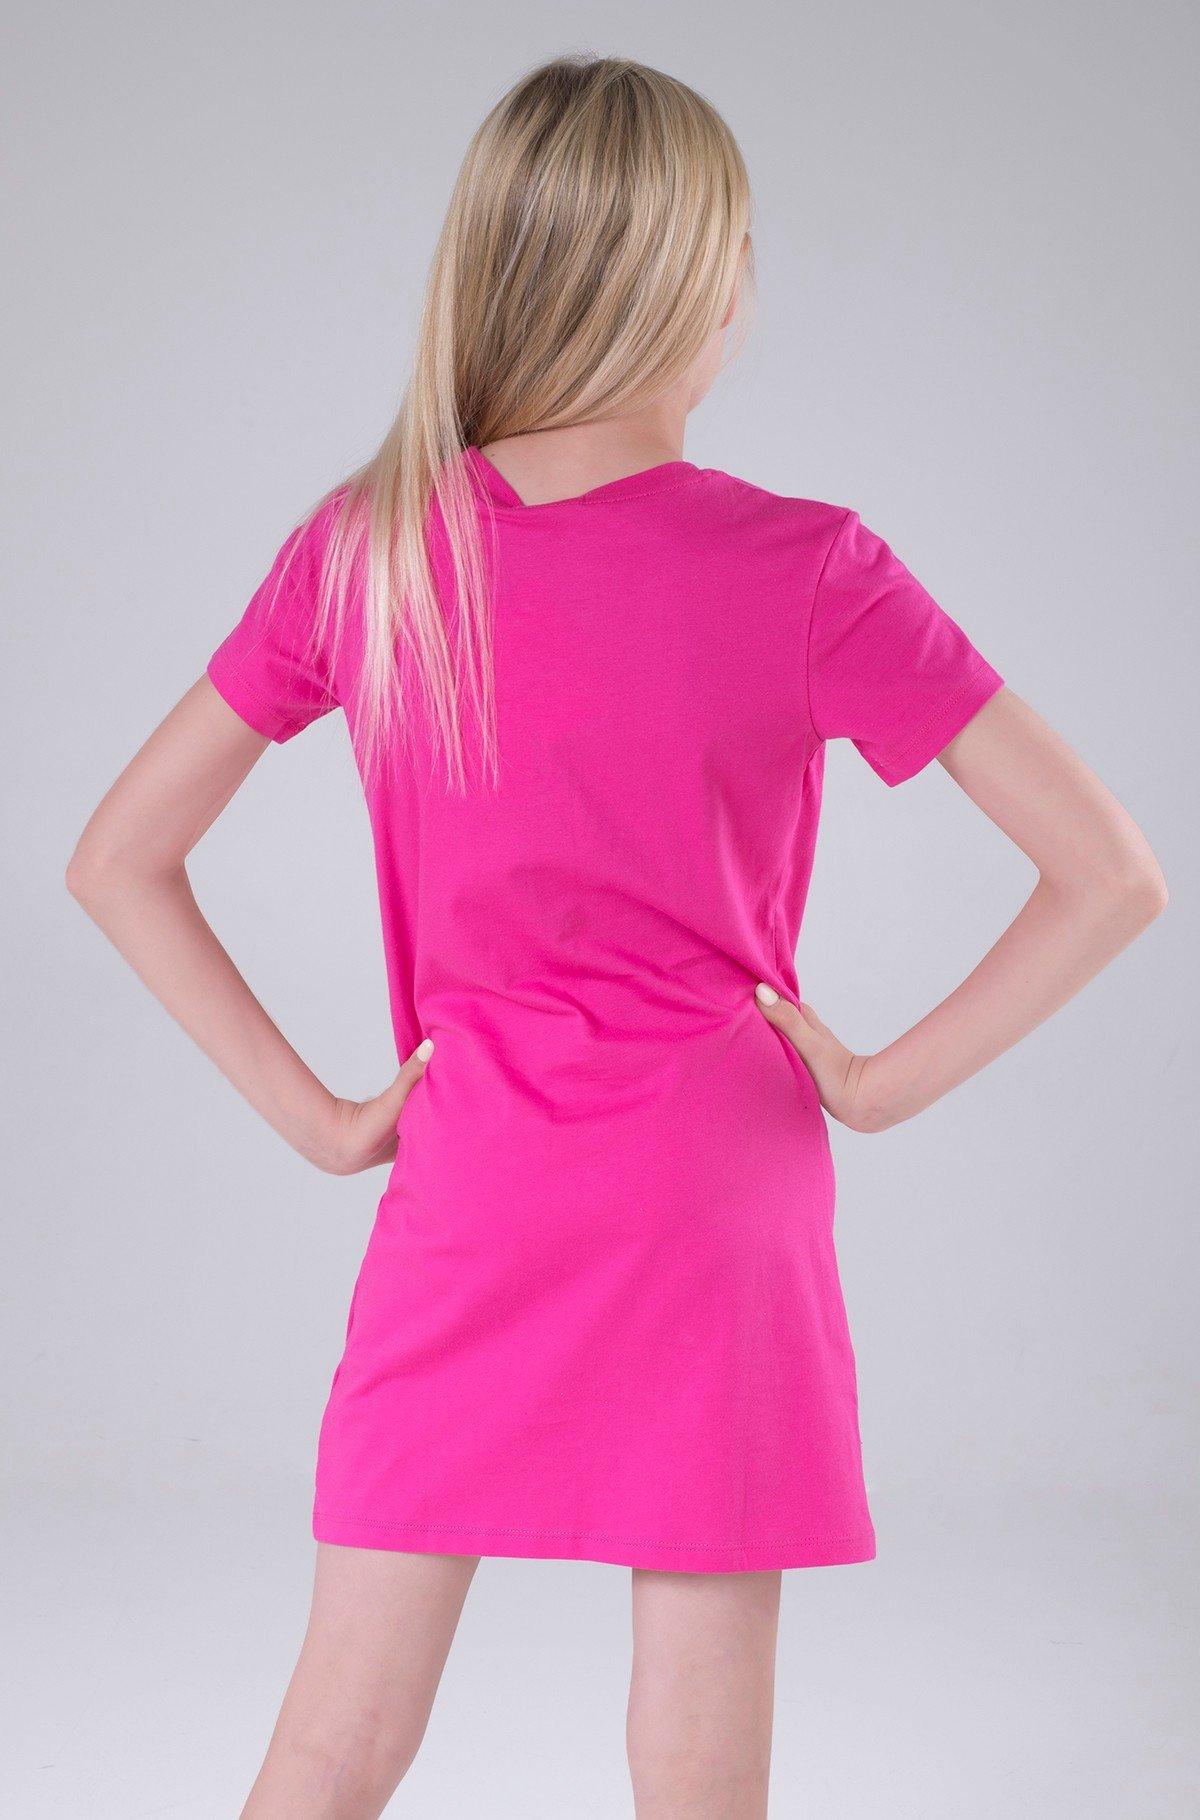 Kreklkleita CK REPEAT FOIL T-SHIRT DRESS-full-3